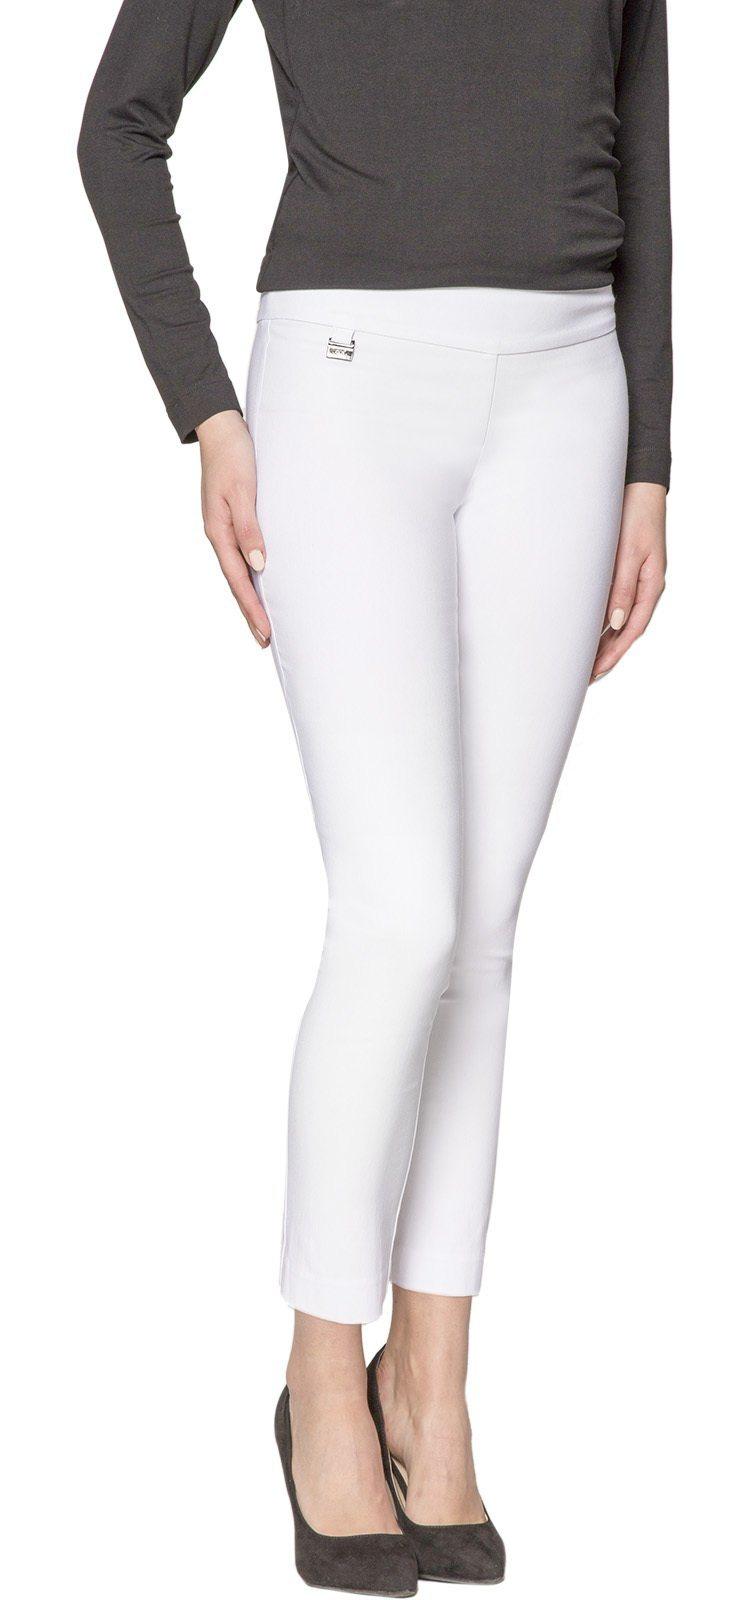 Damen Lisette L Ankle Hosen Perfect fitting Slim weiß | 08718192275510